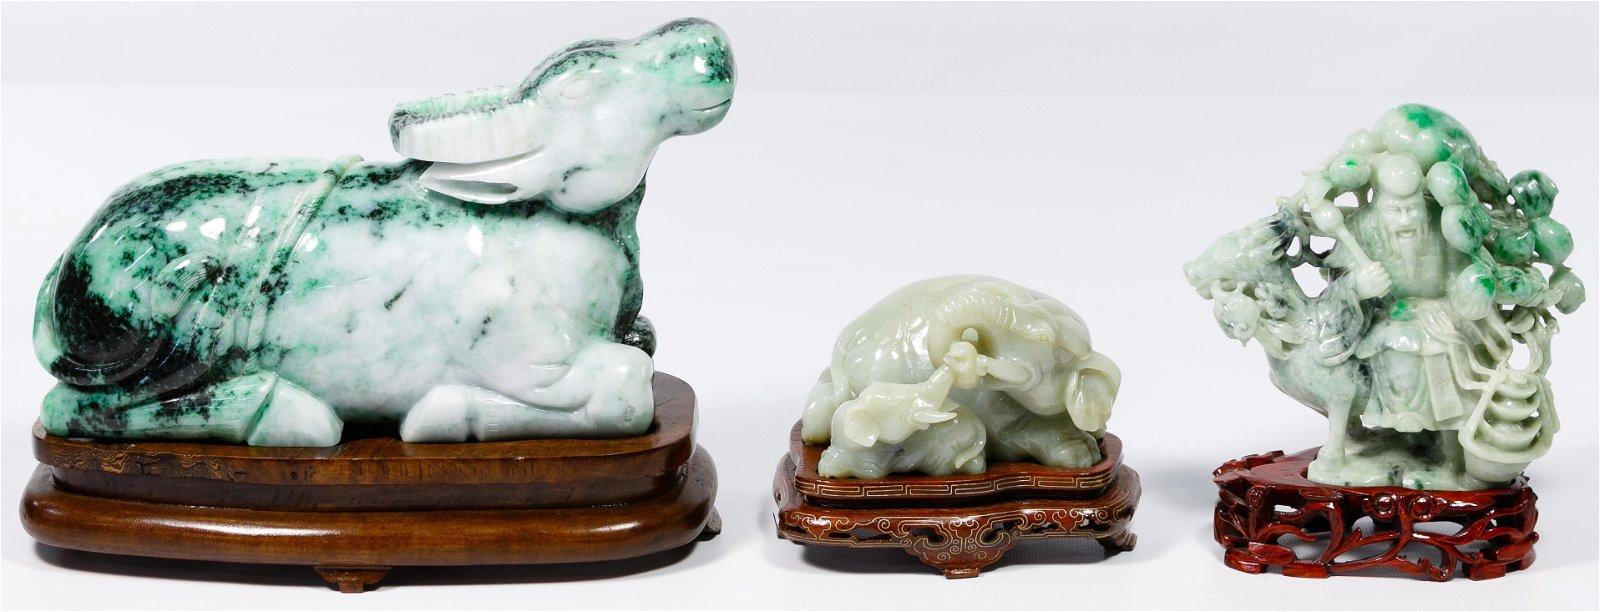 Asian Jadeite Jade Carved Statue Assortment